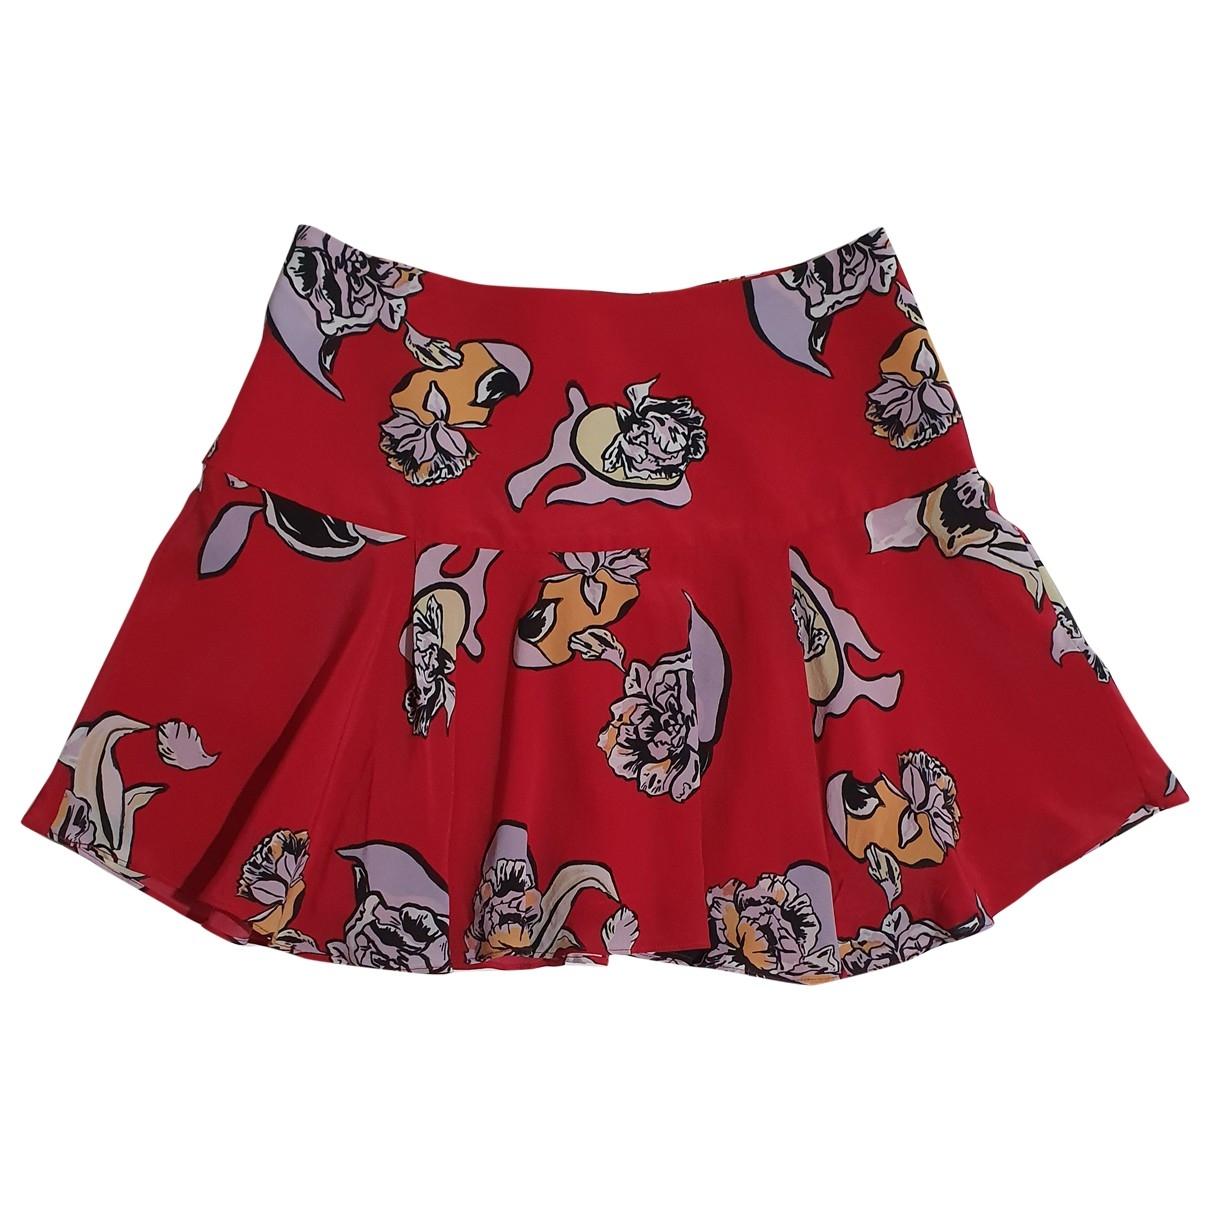 Fallwinterspringsummer \N Multicolour Silk skirt for Women M International